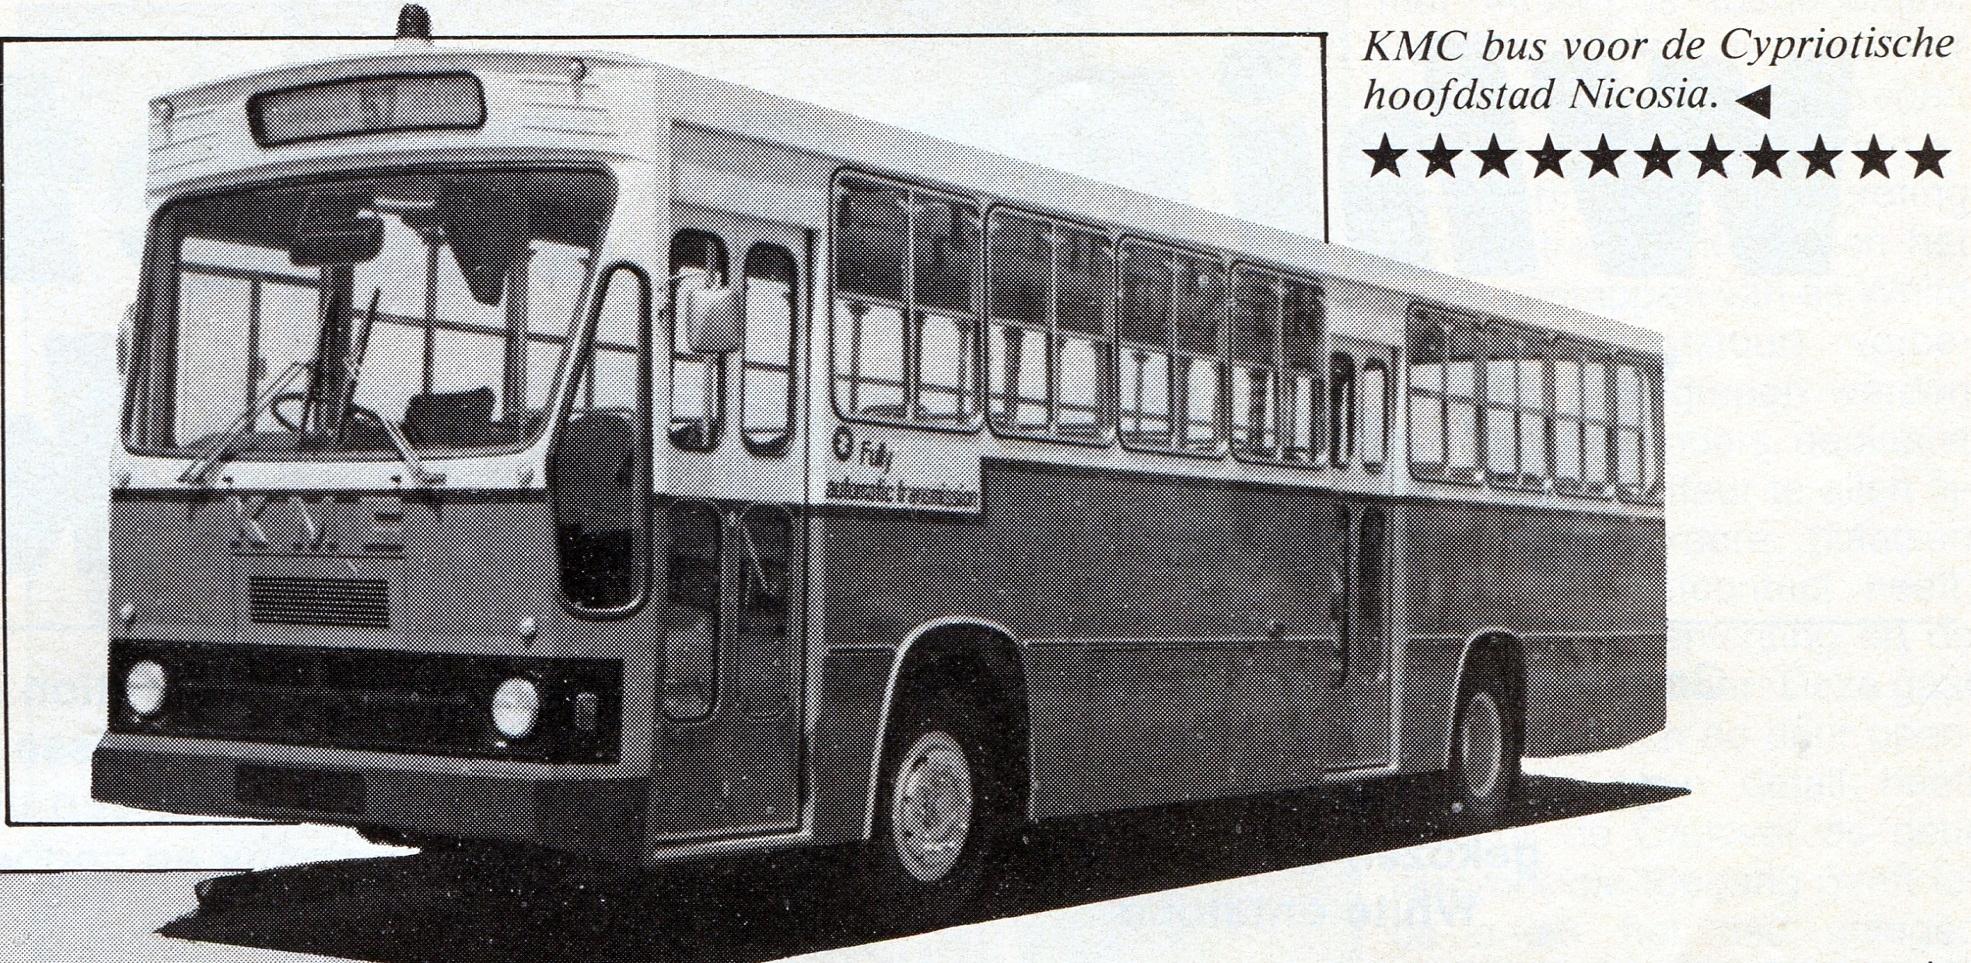 KMC---Foden-repair-cyprus--kaisis-motor-co-kmc-2